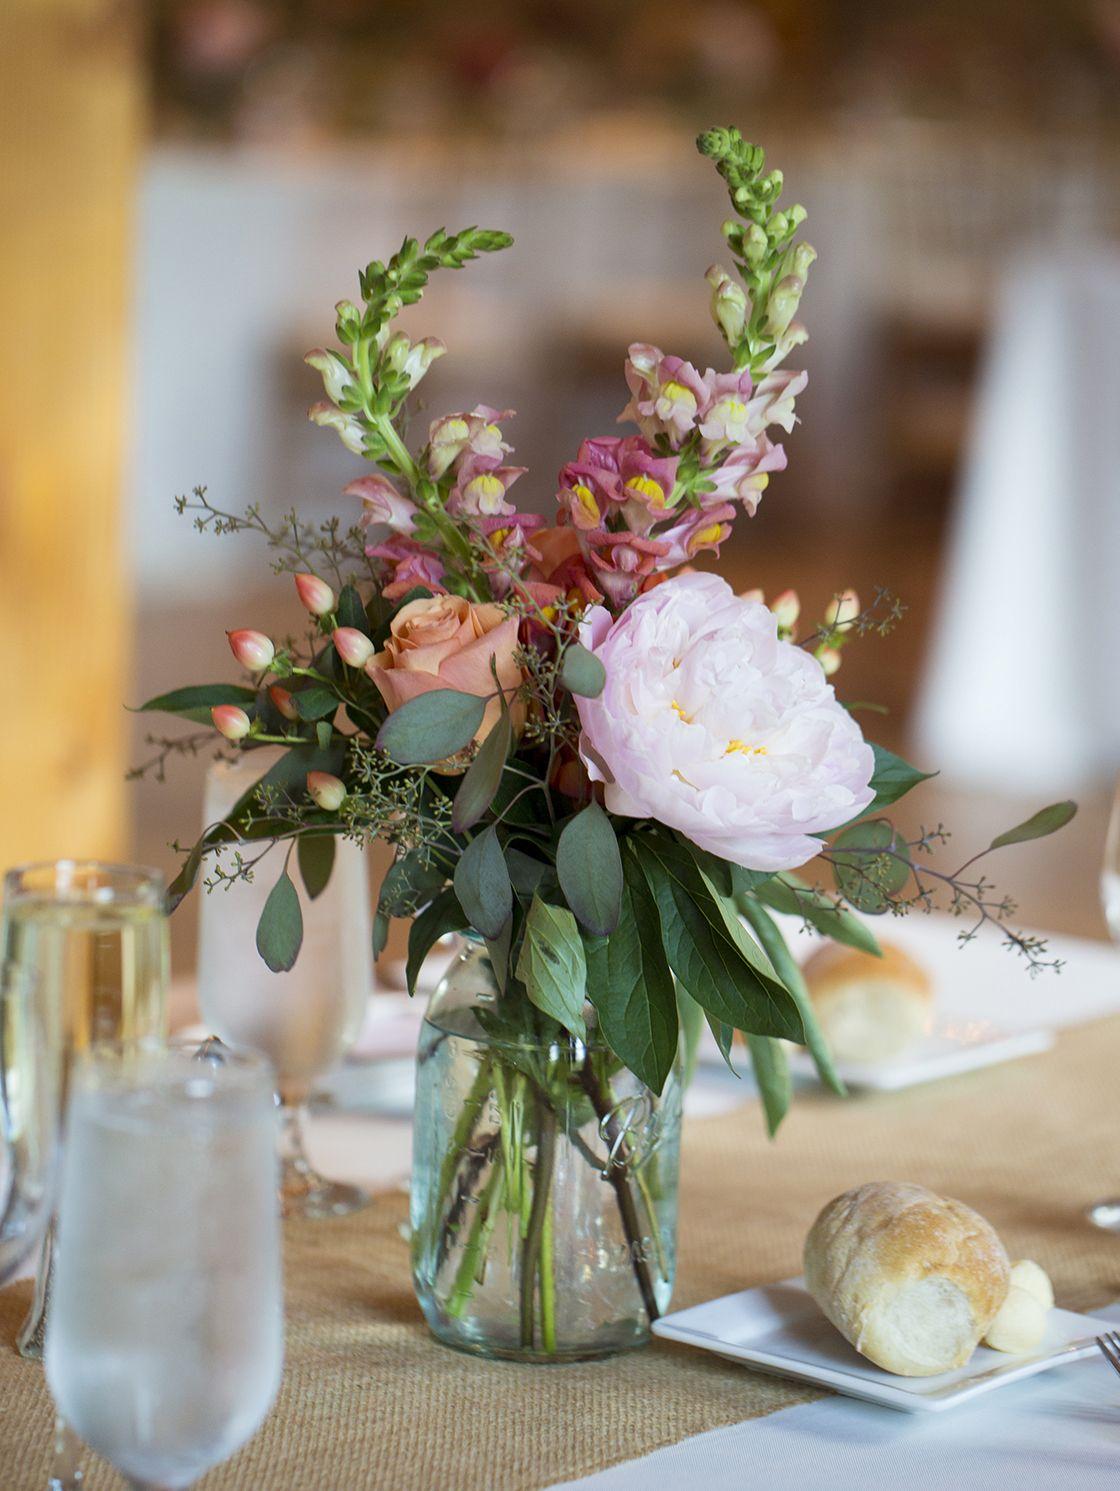 Wedding Flower Centerpiece Colorful Flowers In Blue Mason Jar1 Jpg 1 120 491 Pixels